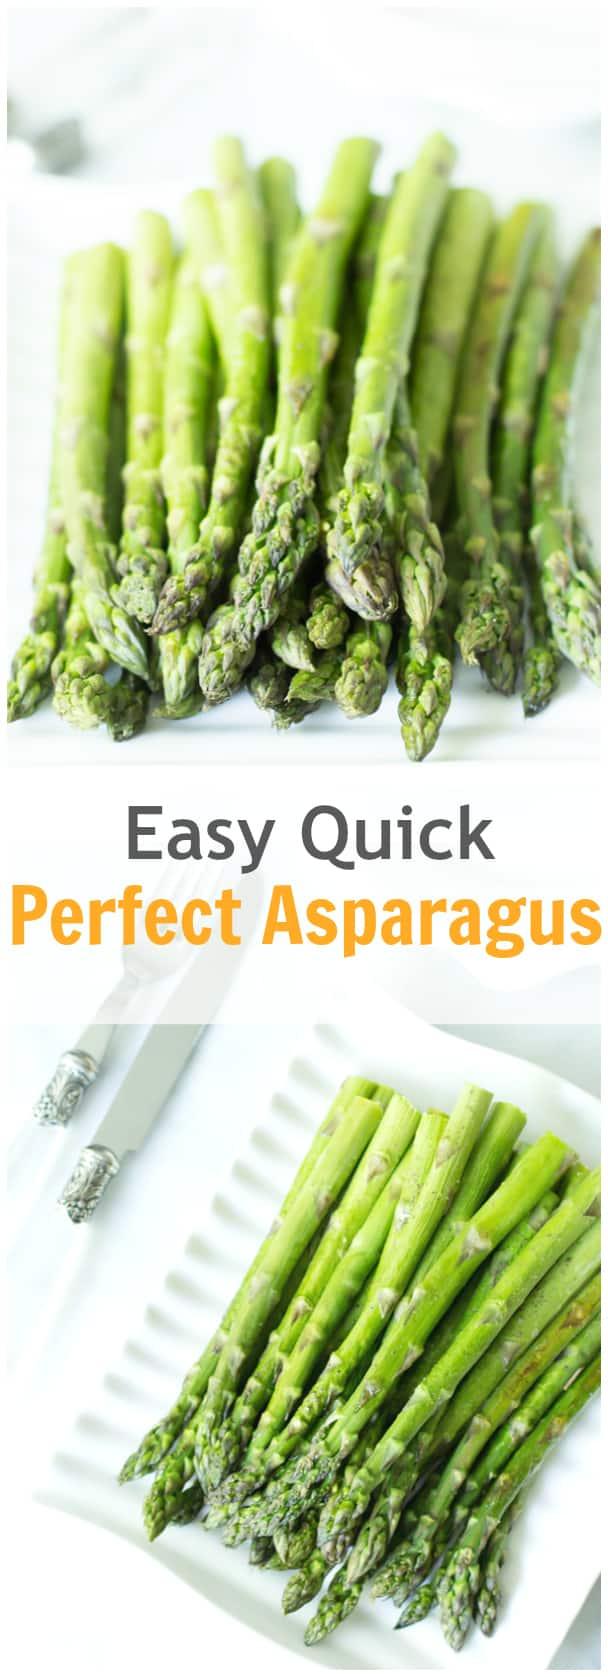 Easy Quick Perfect Asparagus